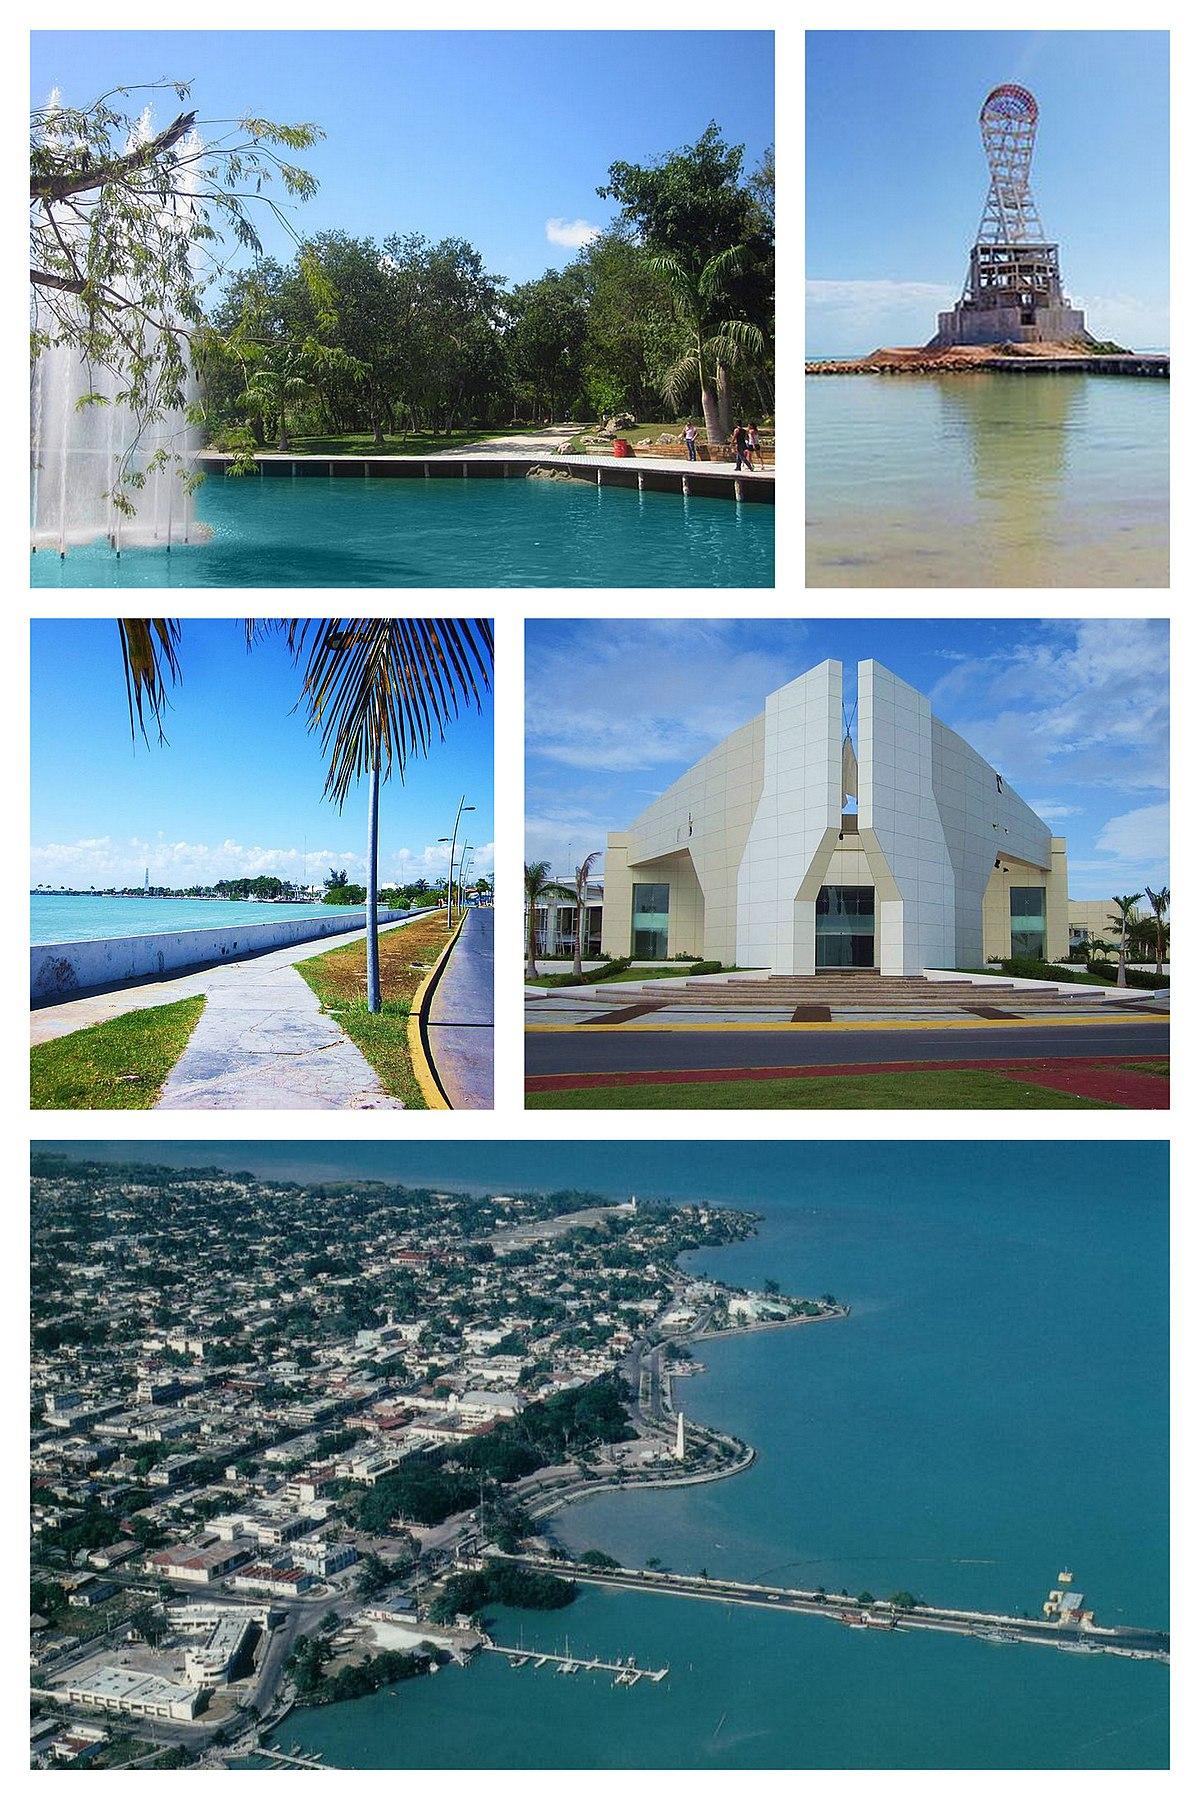 Chetumal - Wikipedia, la enciclopedia libre